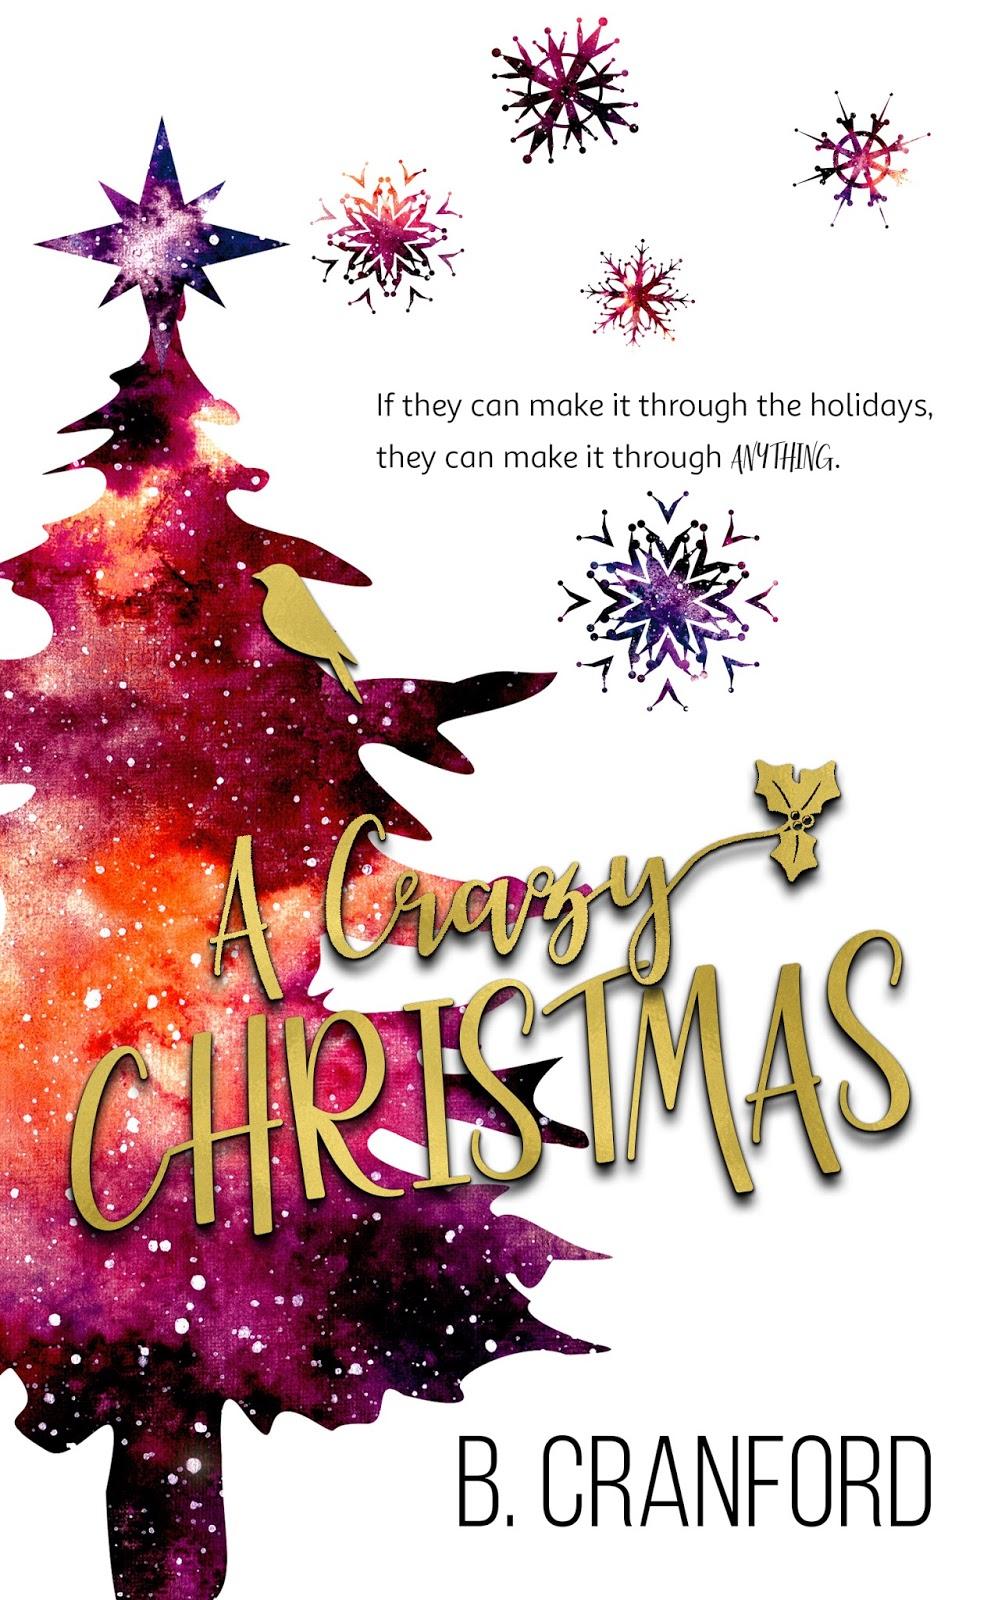 My Own Bookshelves: Release Day A Crazy Christmas: I am \'Crazy ...